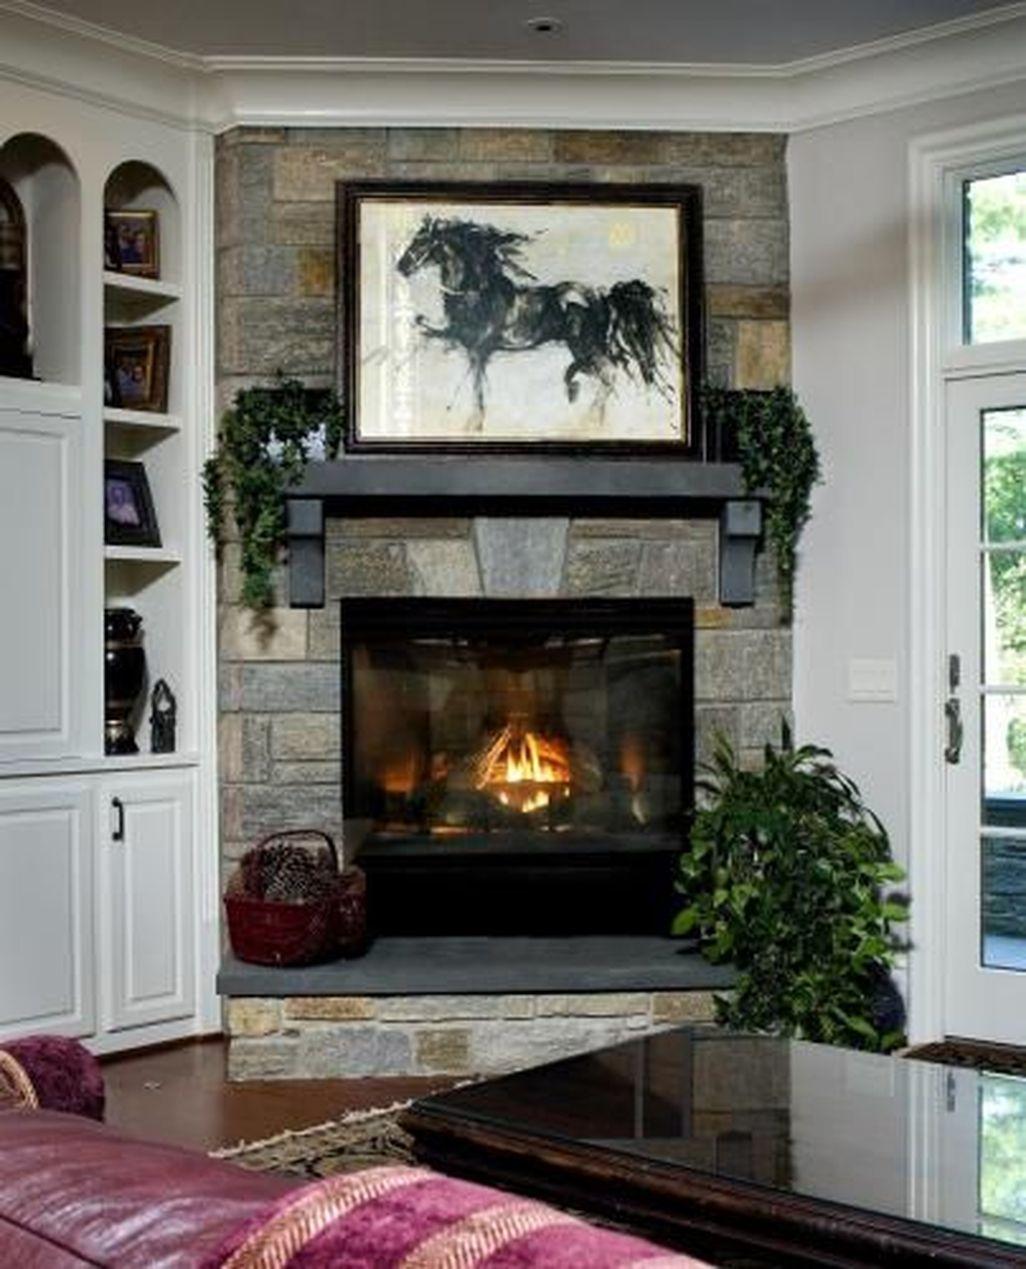 Inspiring Corner Fireplace Ideas In The Living Room 22